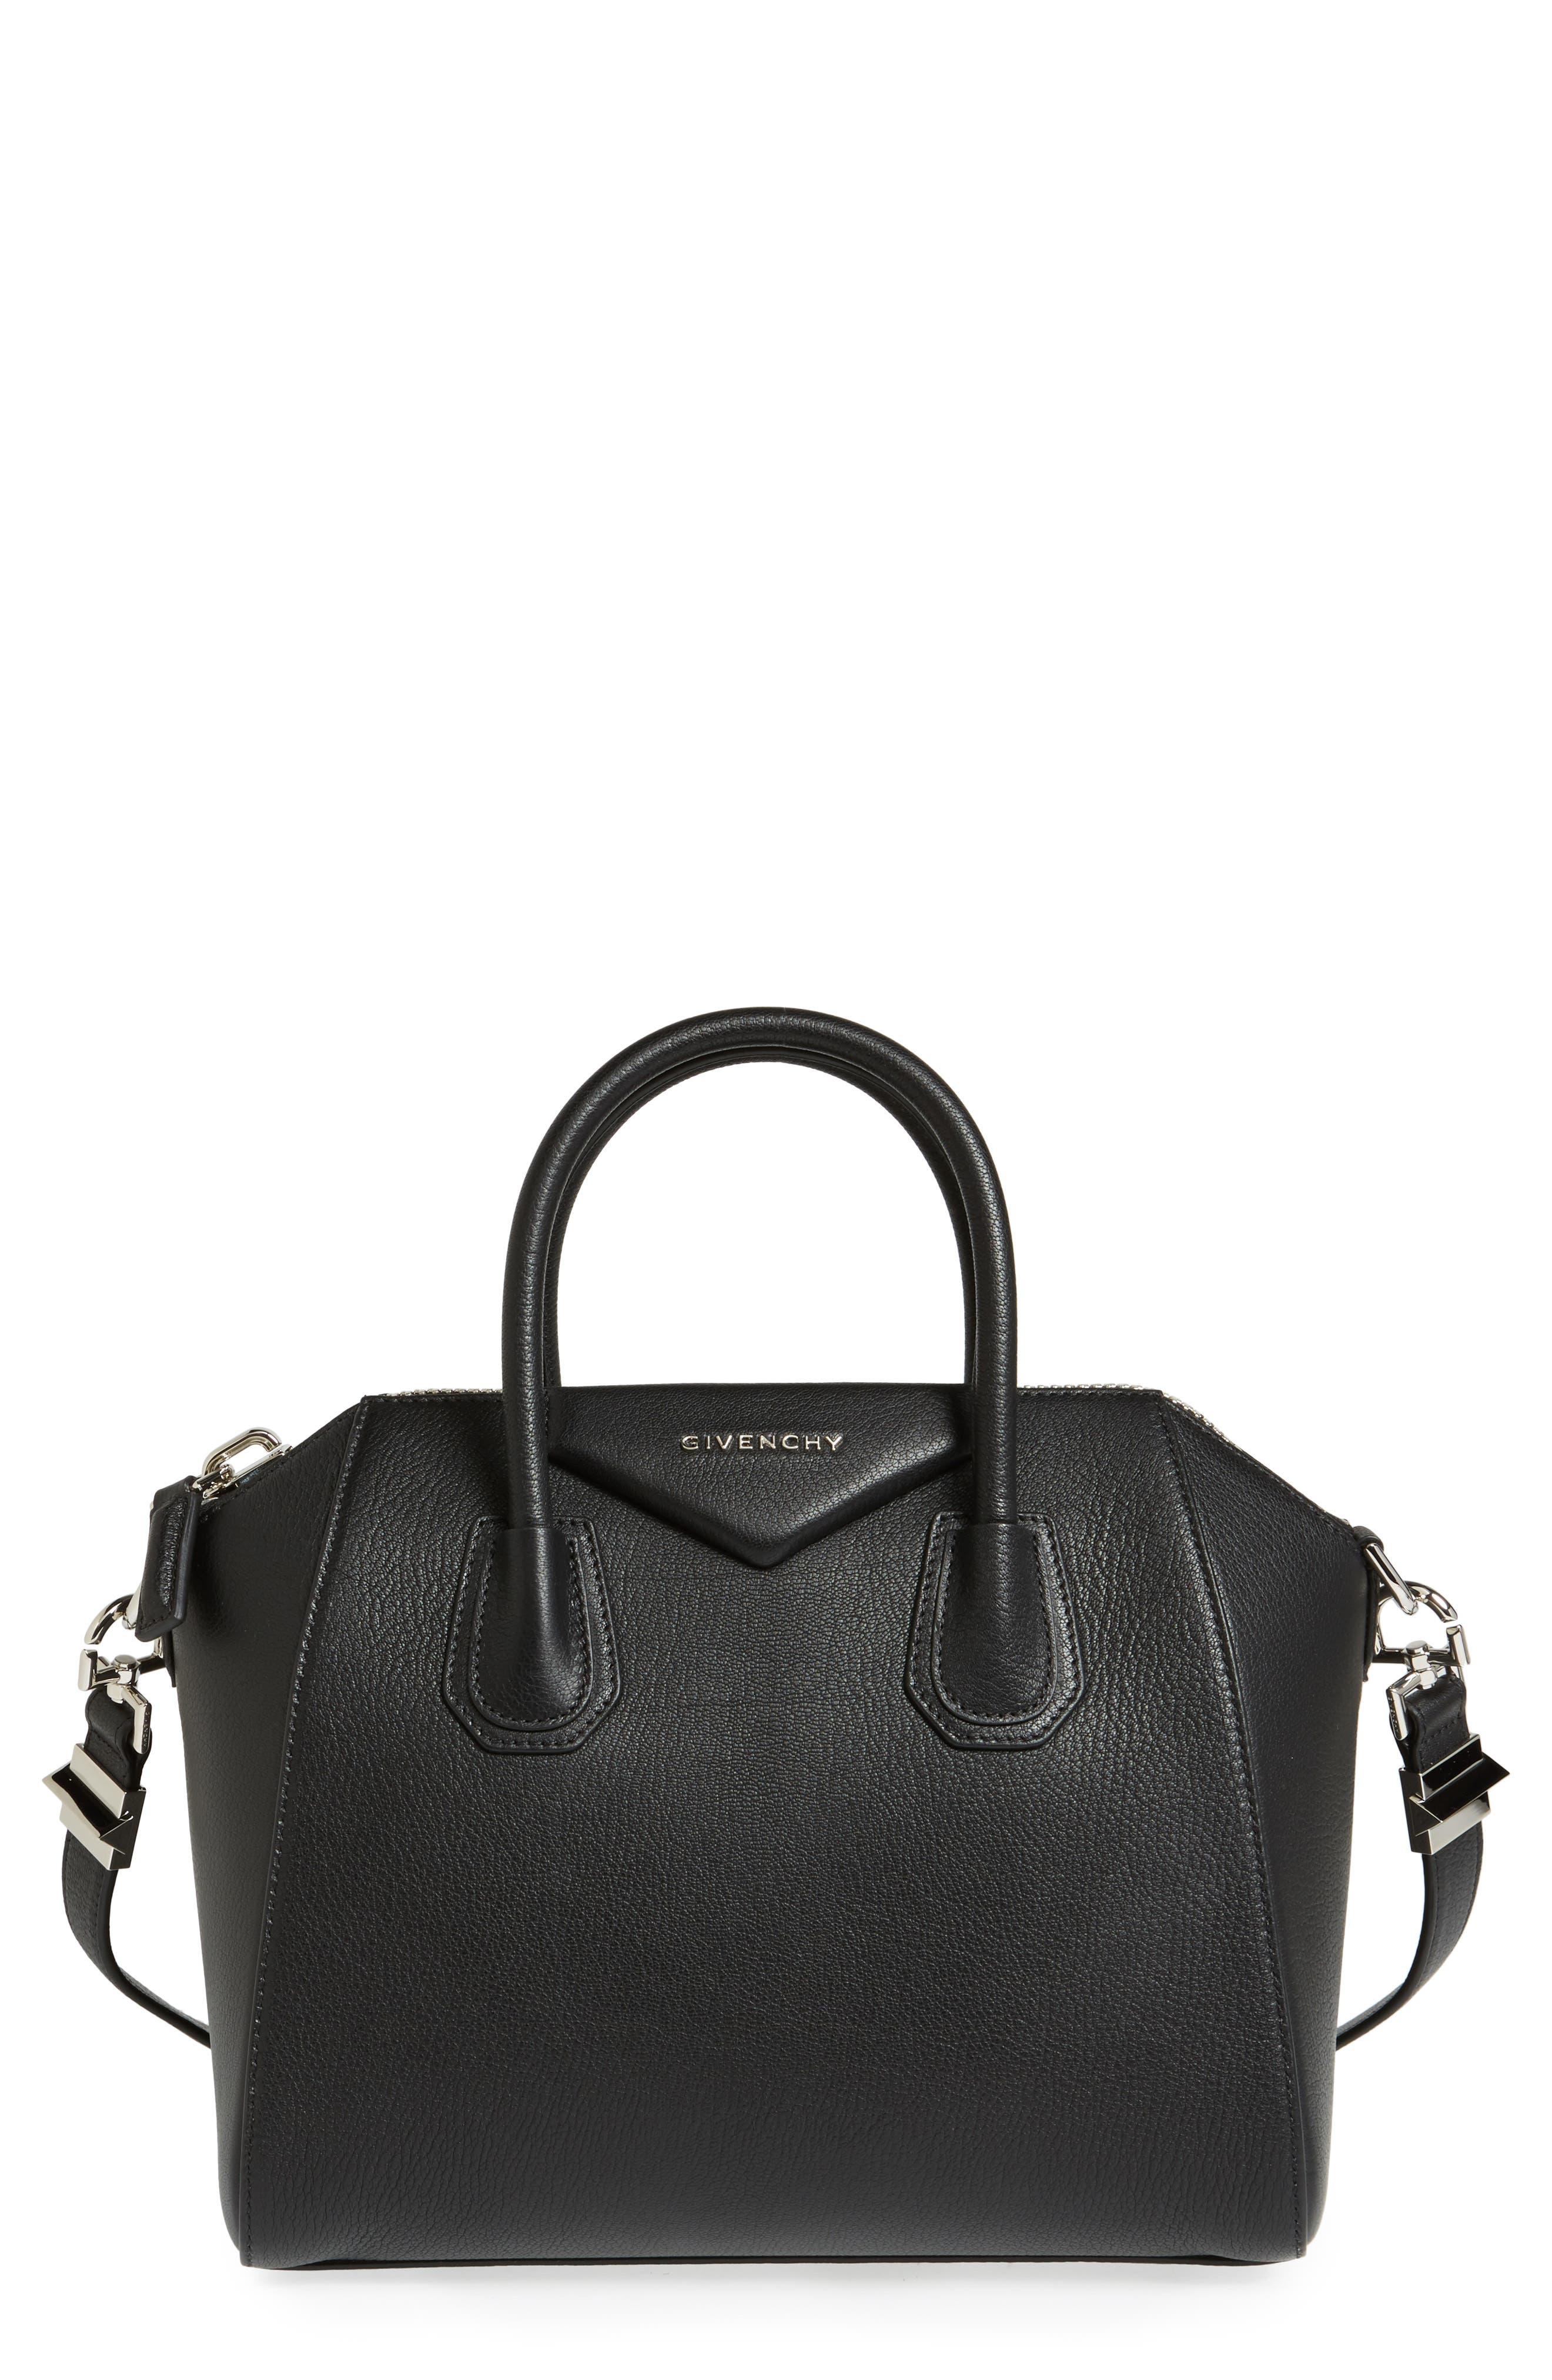 Givenchy Small Antigona Leather Satchel - Black